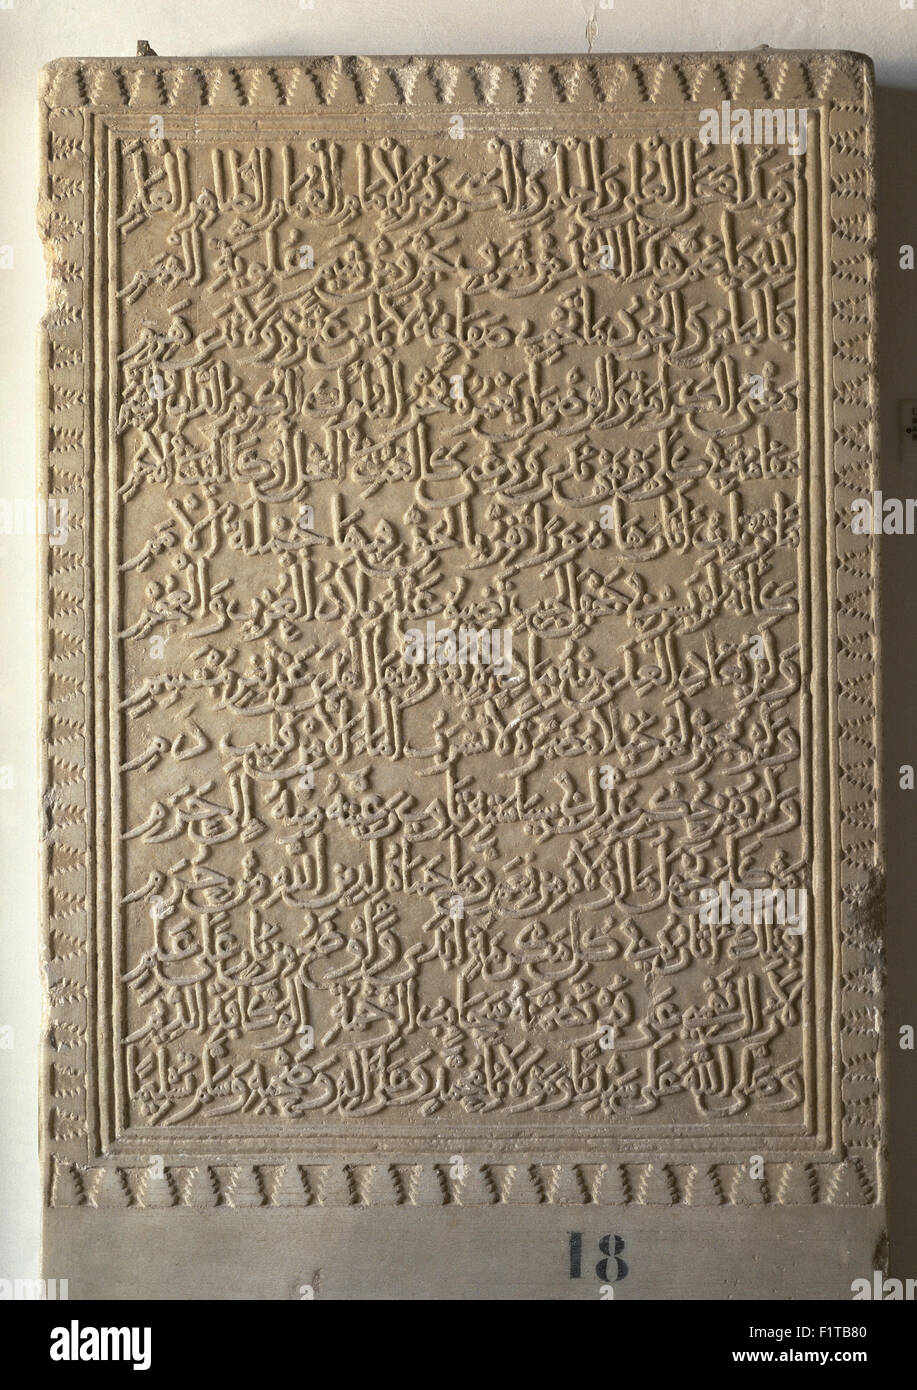 Muhammed II al-Faqih (1234-1302) Second Nasrid ruler of the Emirate of Granada in Al-Andalus. Sepulchral stele. - Stock Image